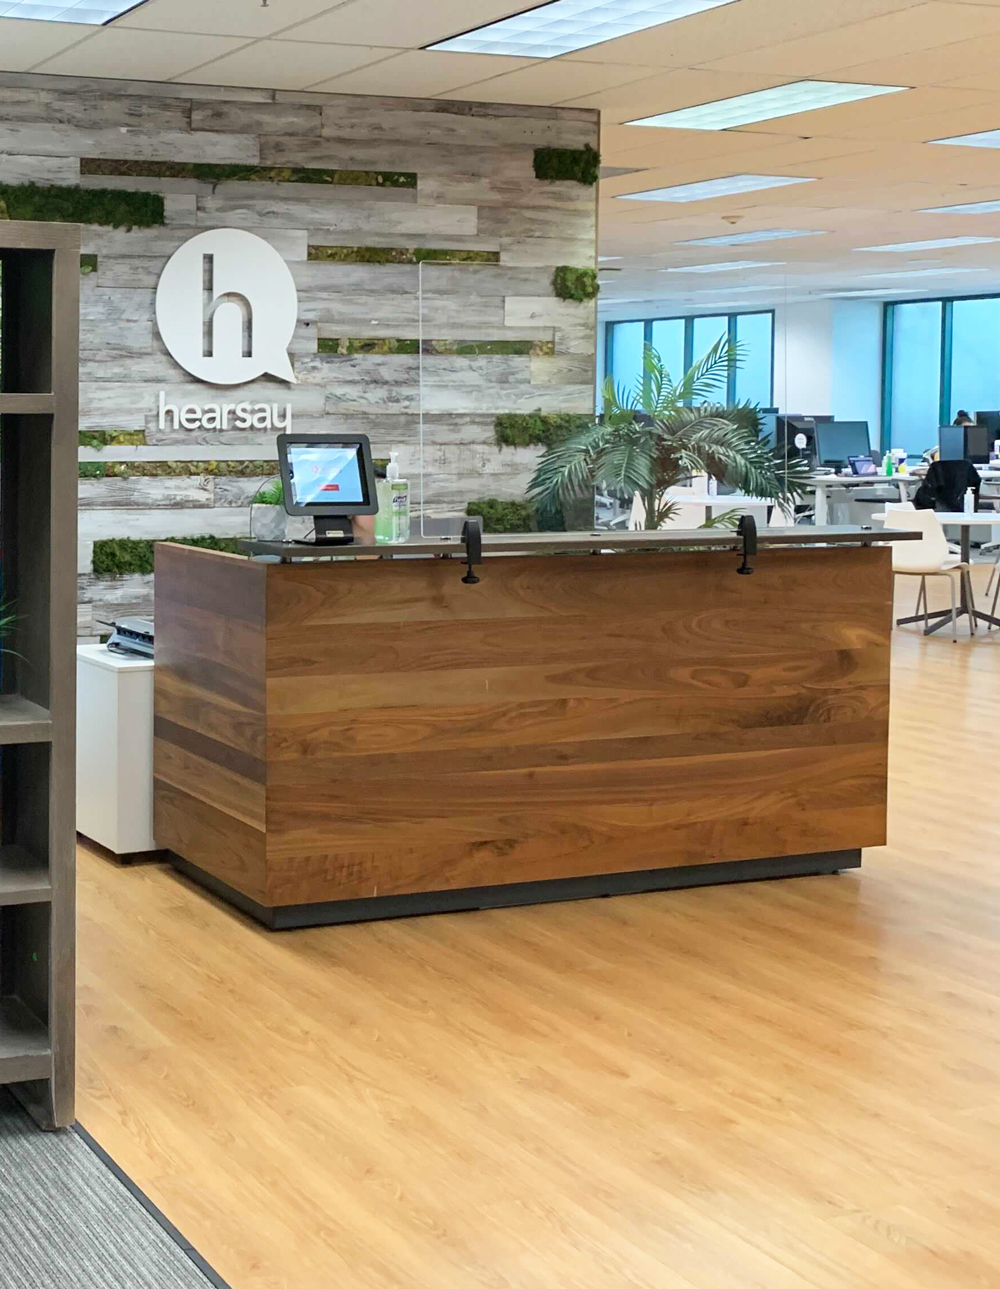 Hearsay San Francisco office front desk